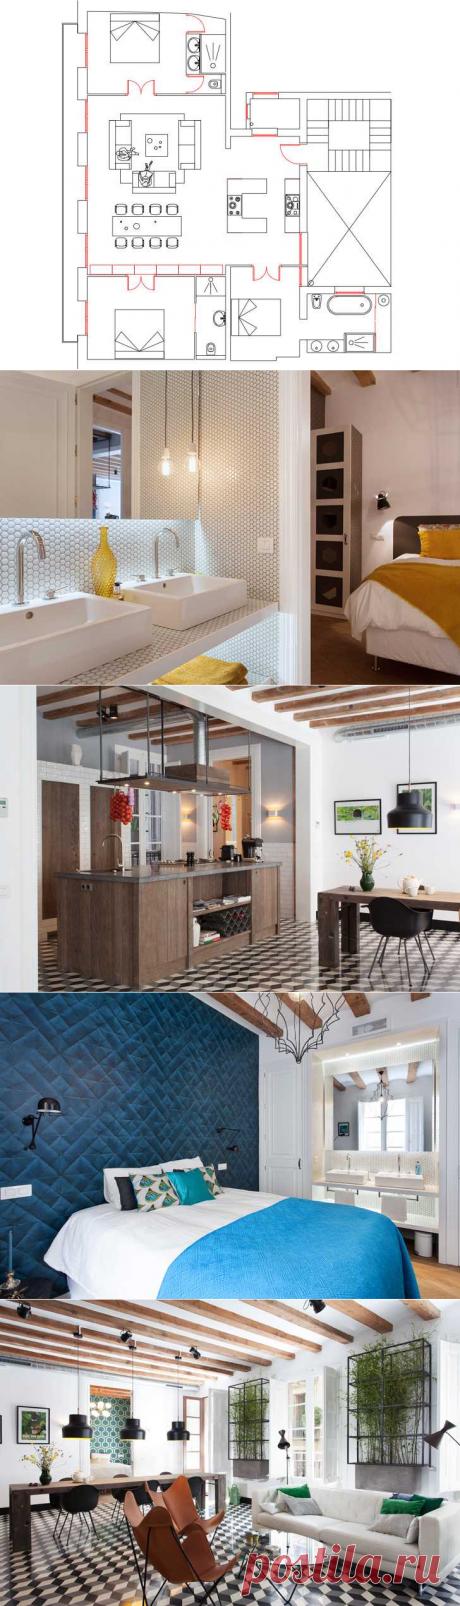 〚 Квартира в бывшем общежитии в Барселоне 〛 ◾ Фото ◾Идеи◾ Дизайн